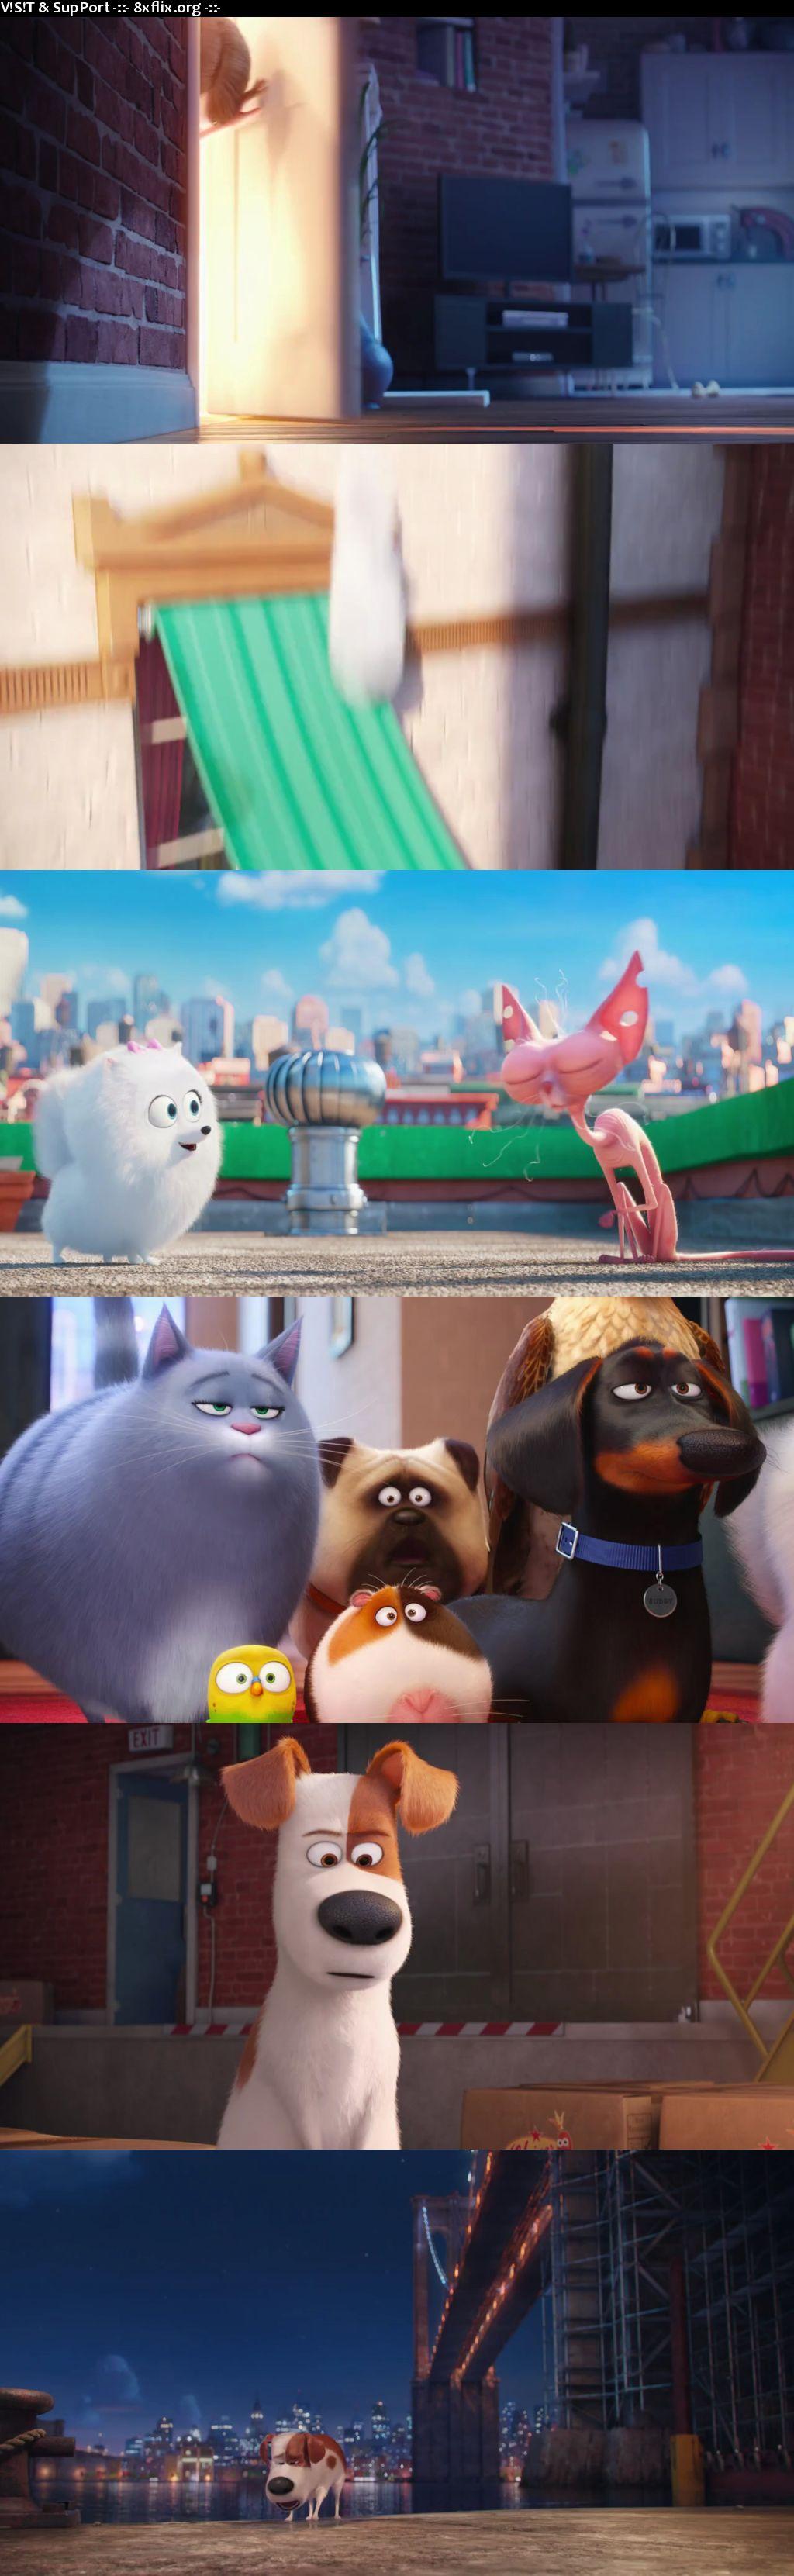 The Secret Life Of Pets 2016 Hindi English Dual Audio 720p 480p BluRay